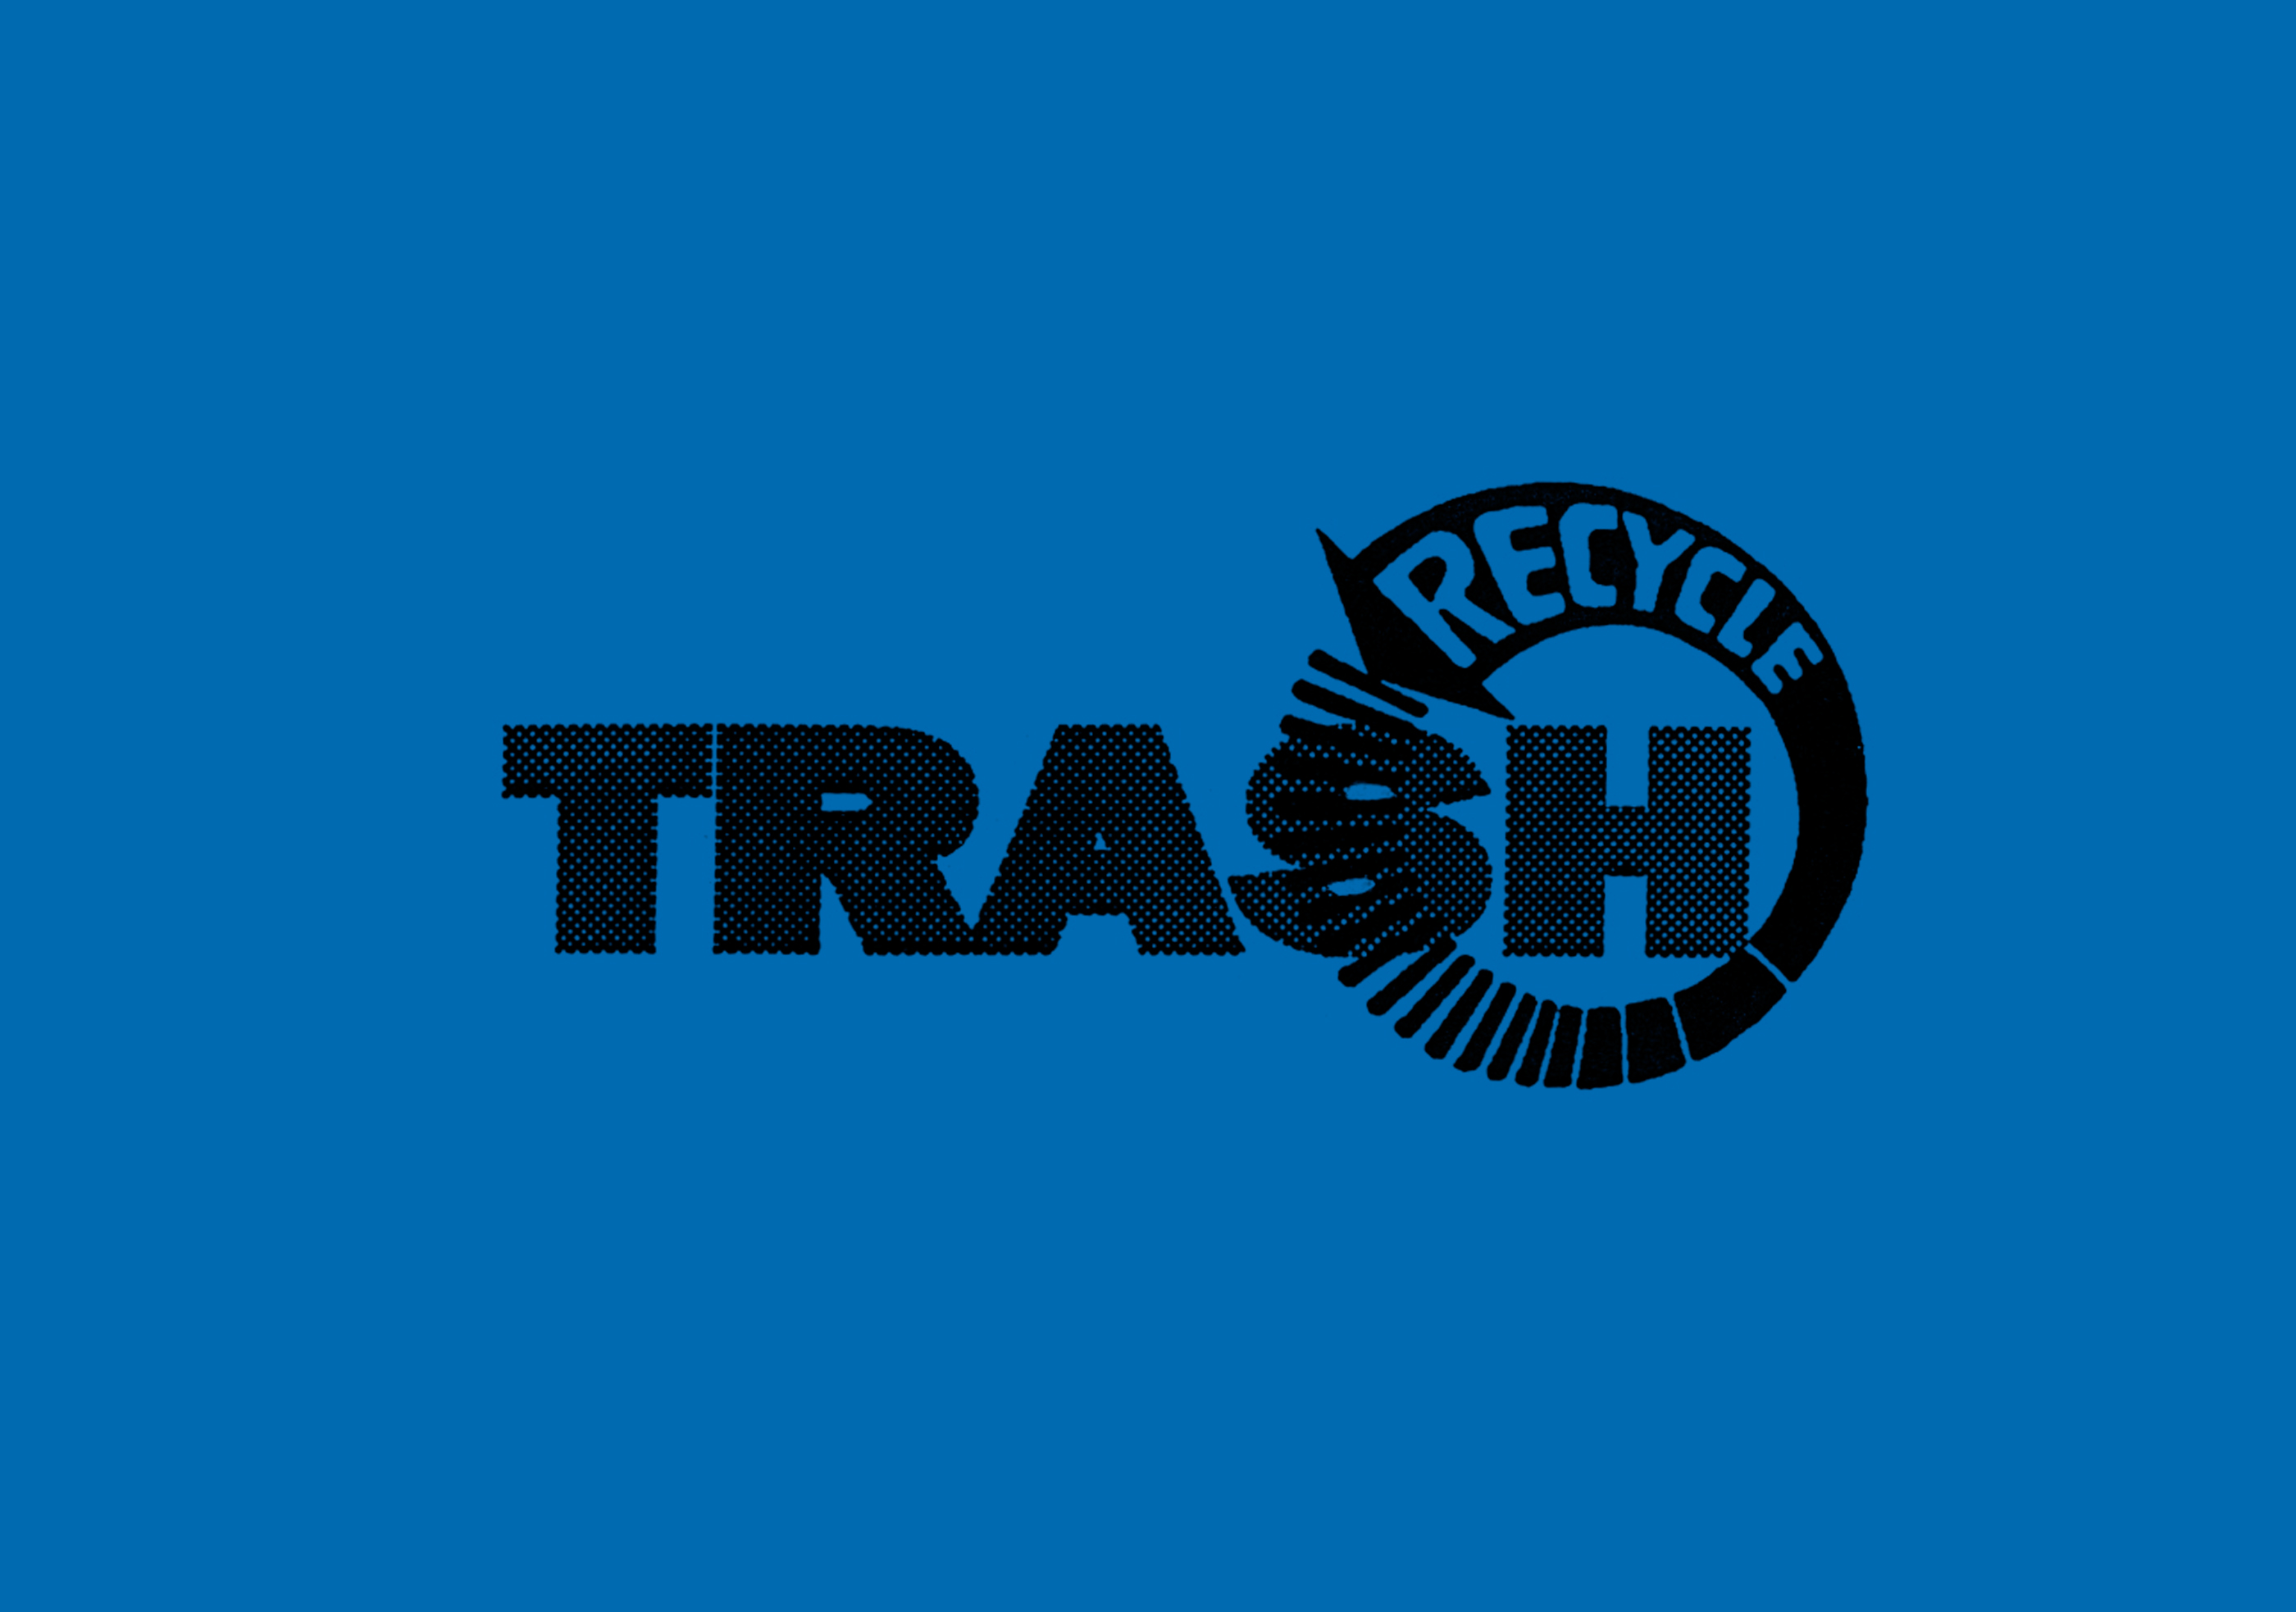 eden_trash_logo